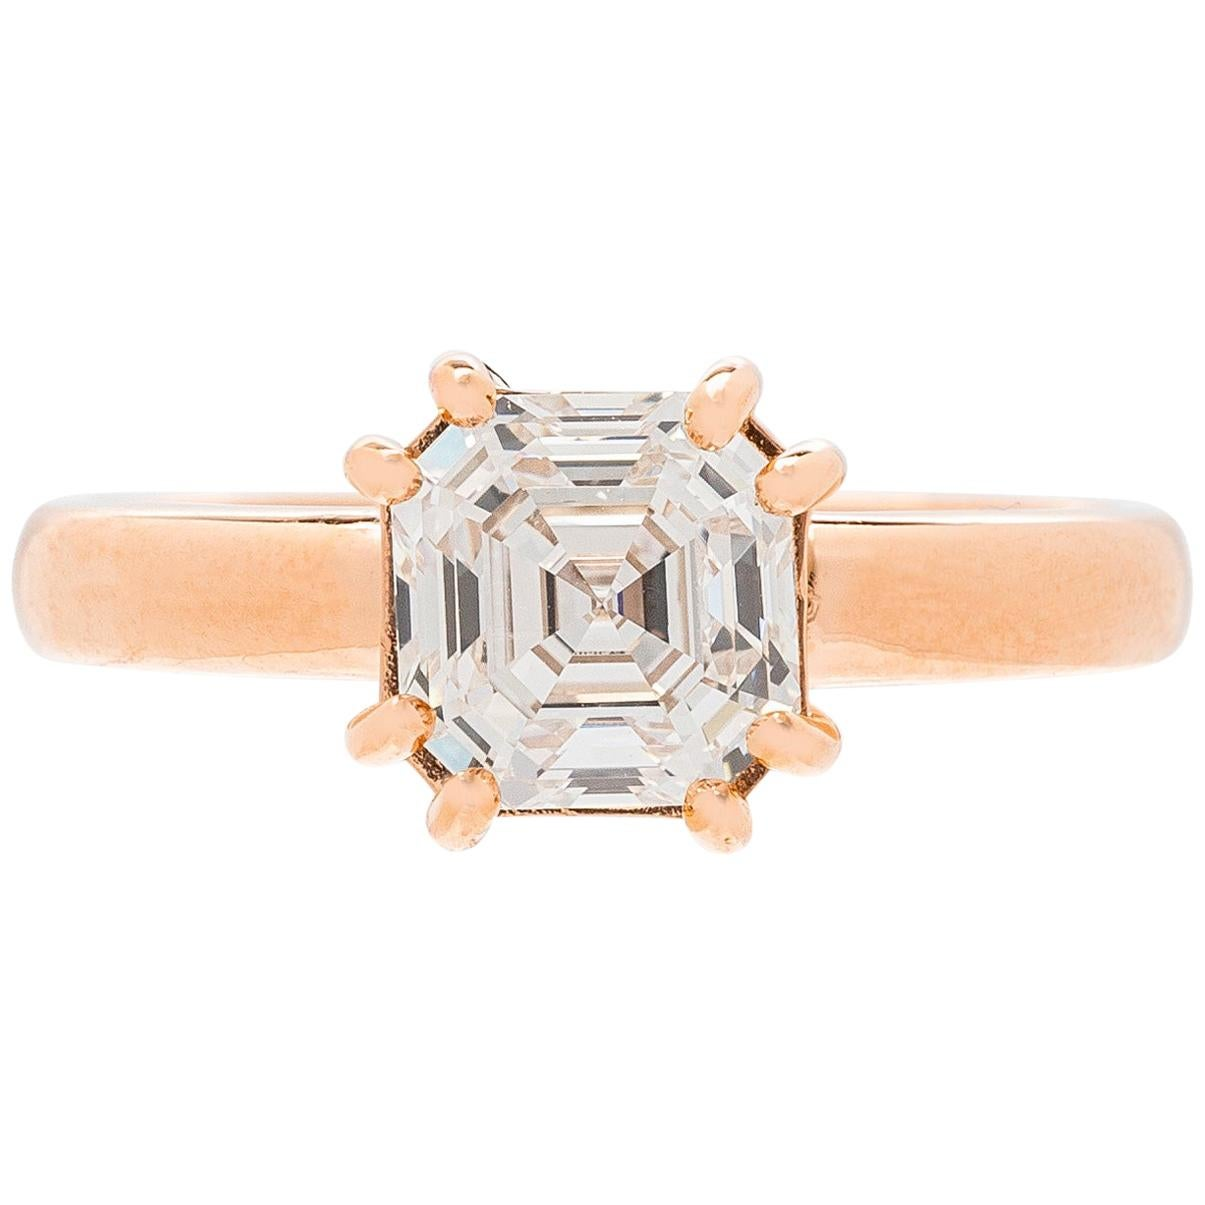 1.68 Carat GIA G/IF Square Emerald Cut Diamond Rose Gold Ring